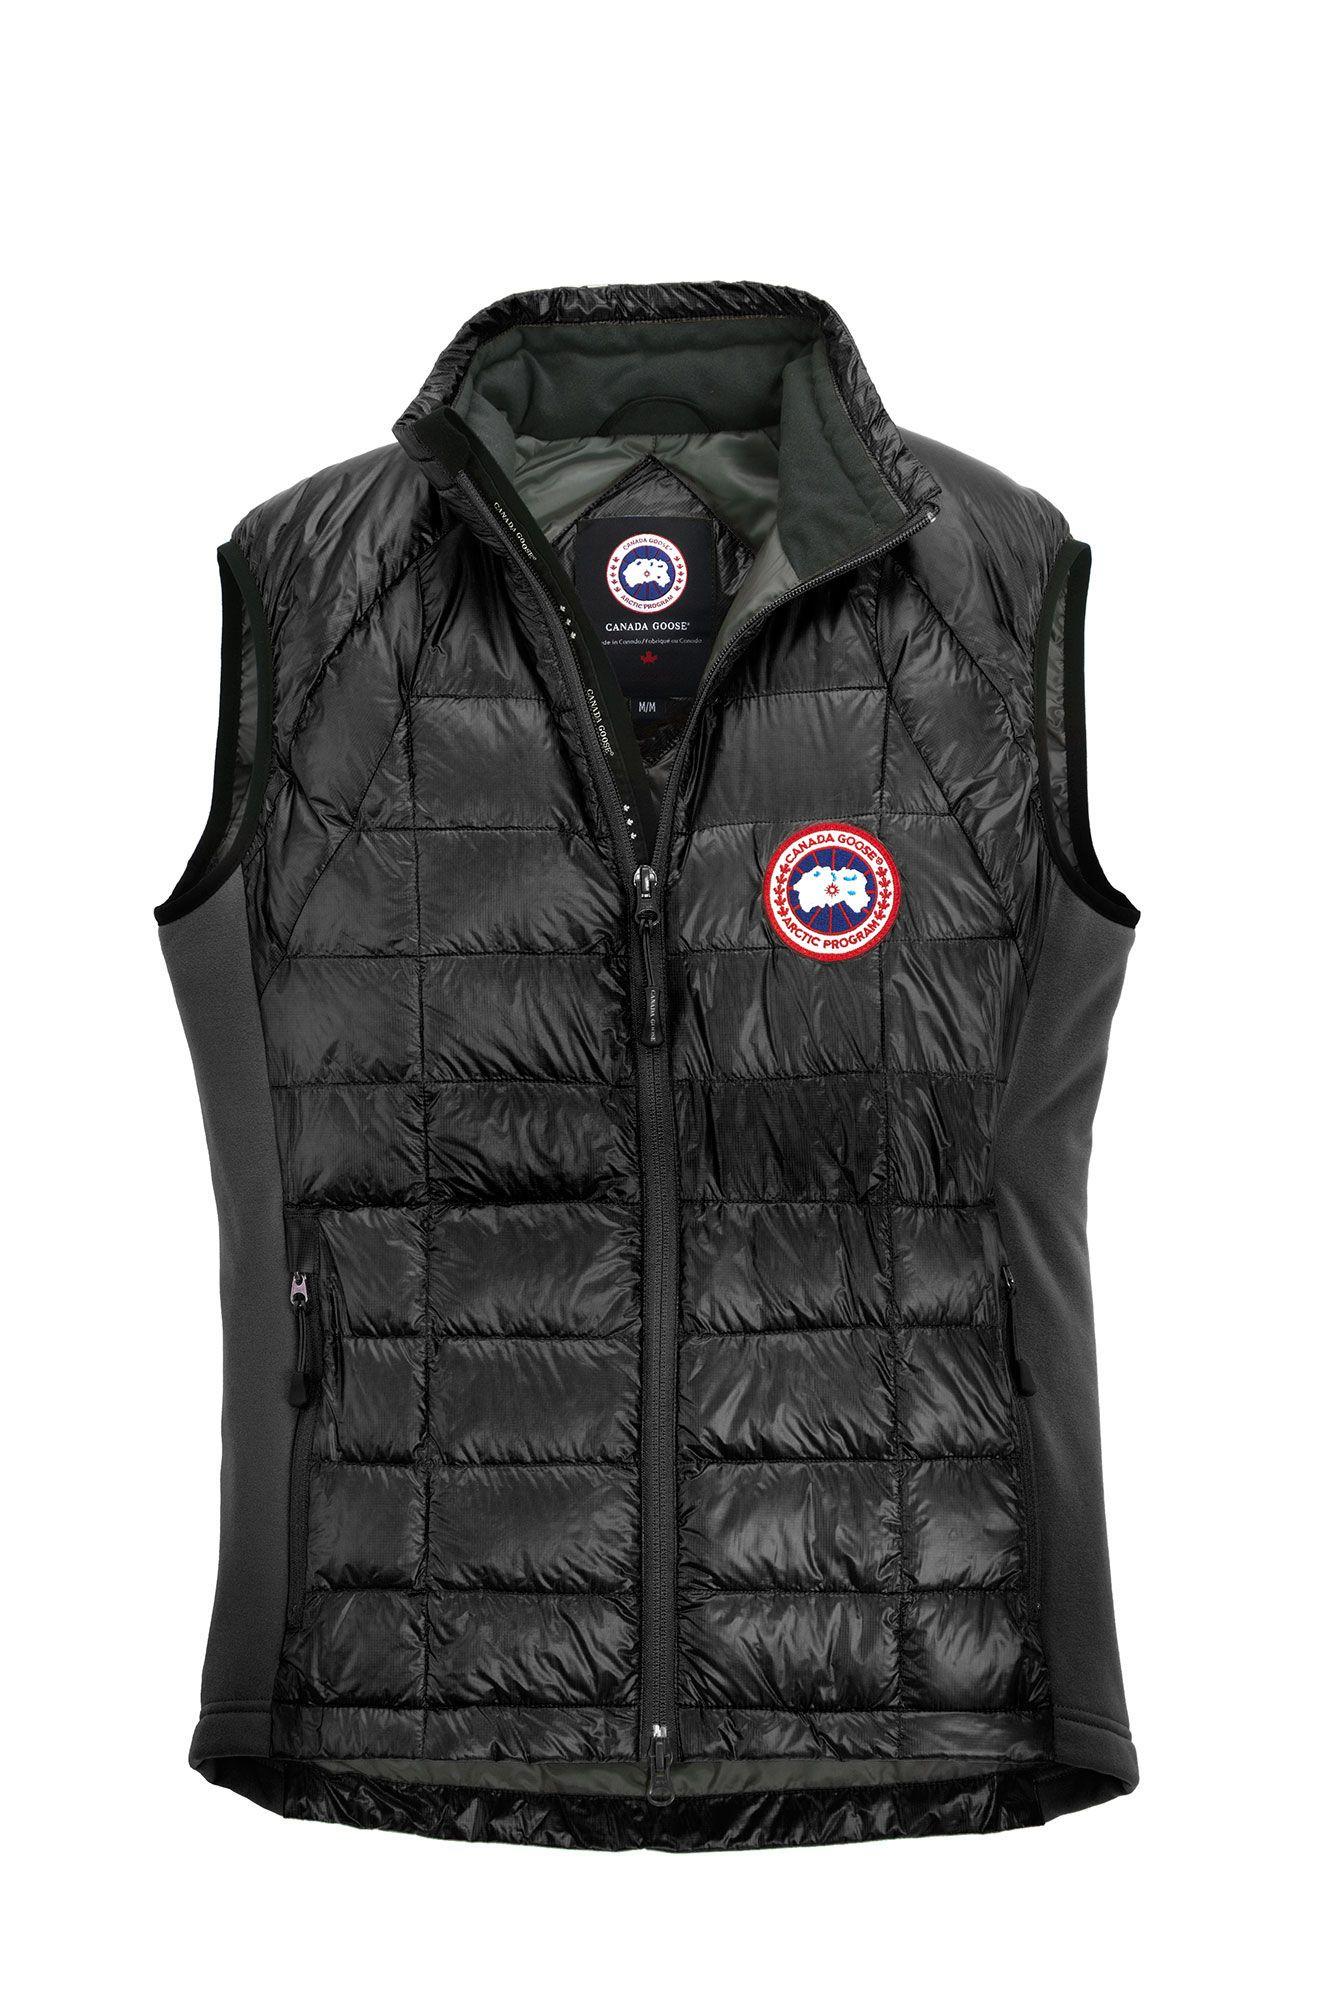 mens hybridge hybridge lite vest canada goose put this on rh pinterest com